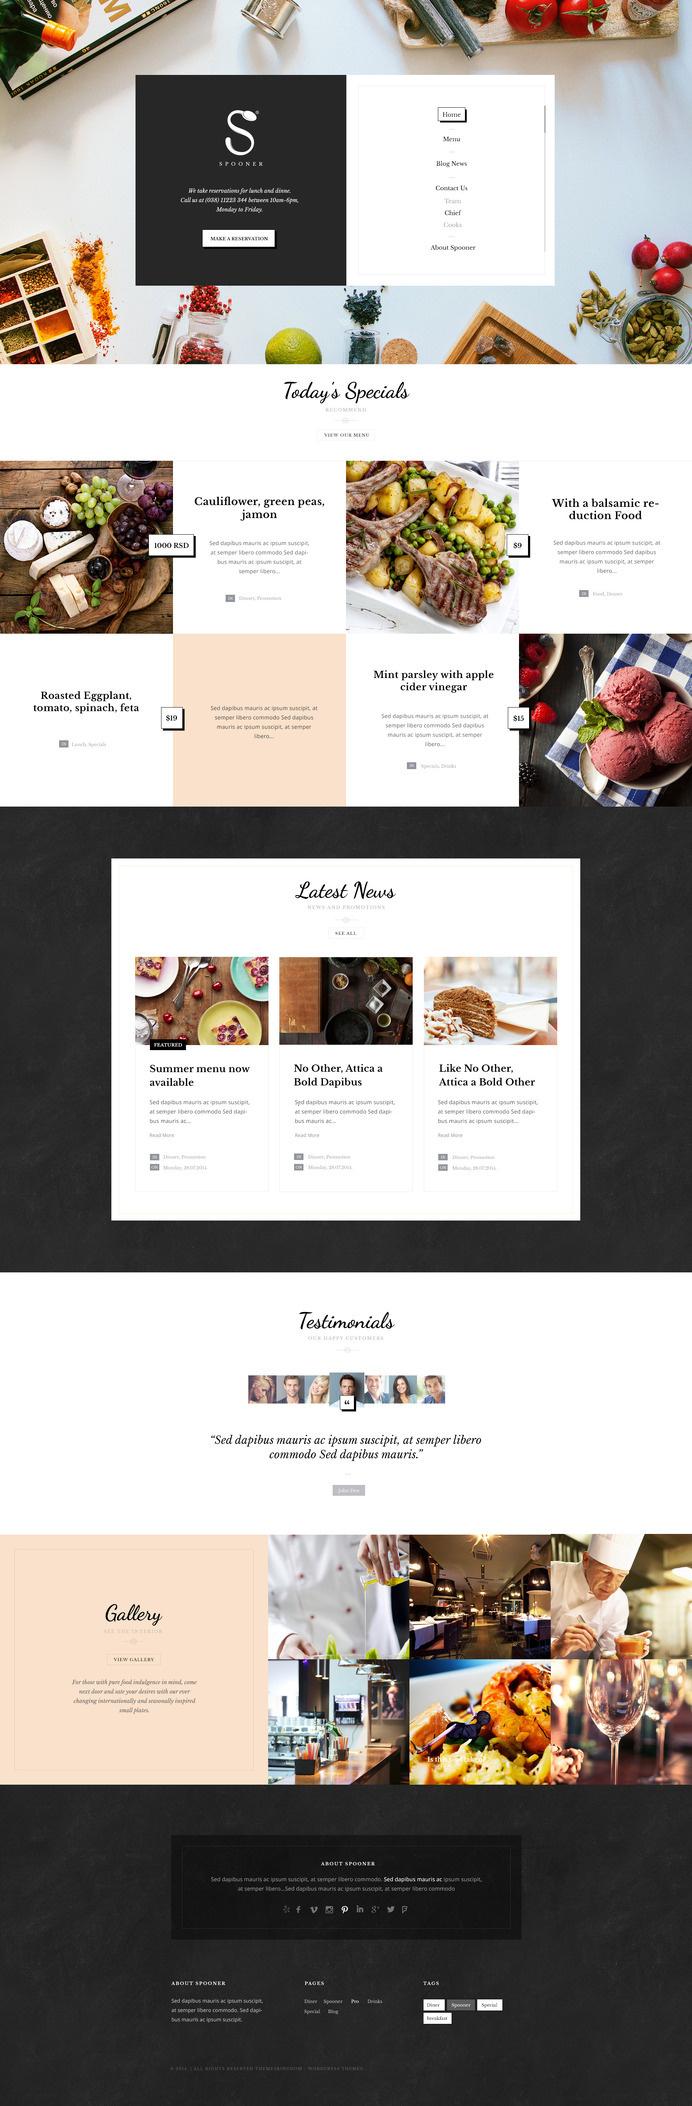 Spooner restaurant bar wordpress theme in web design